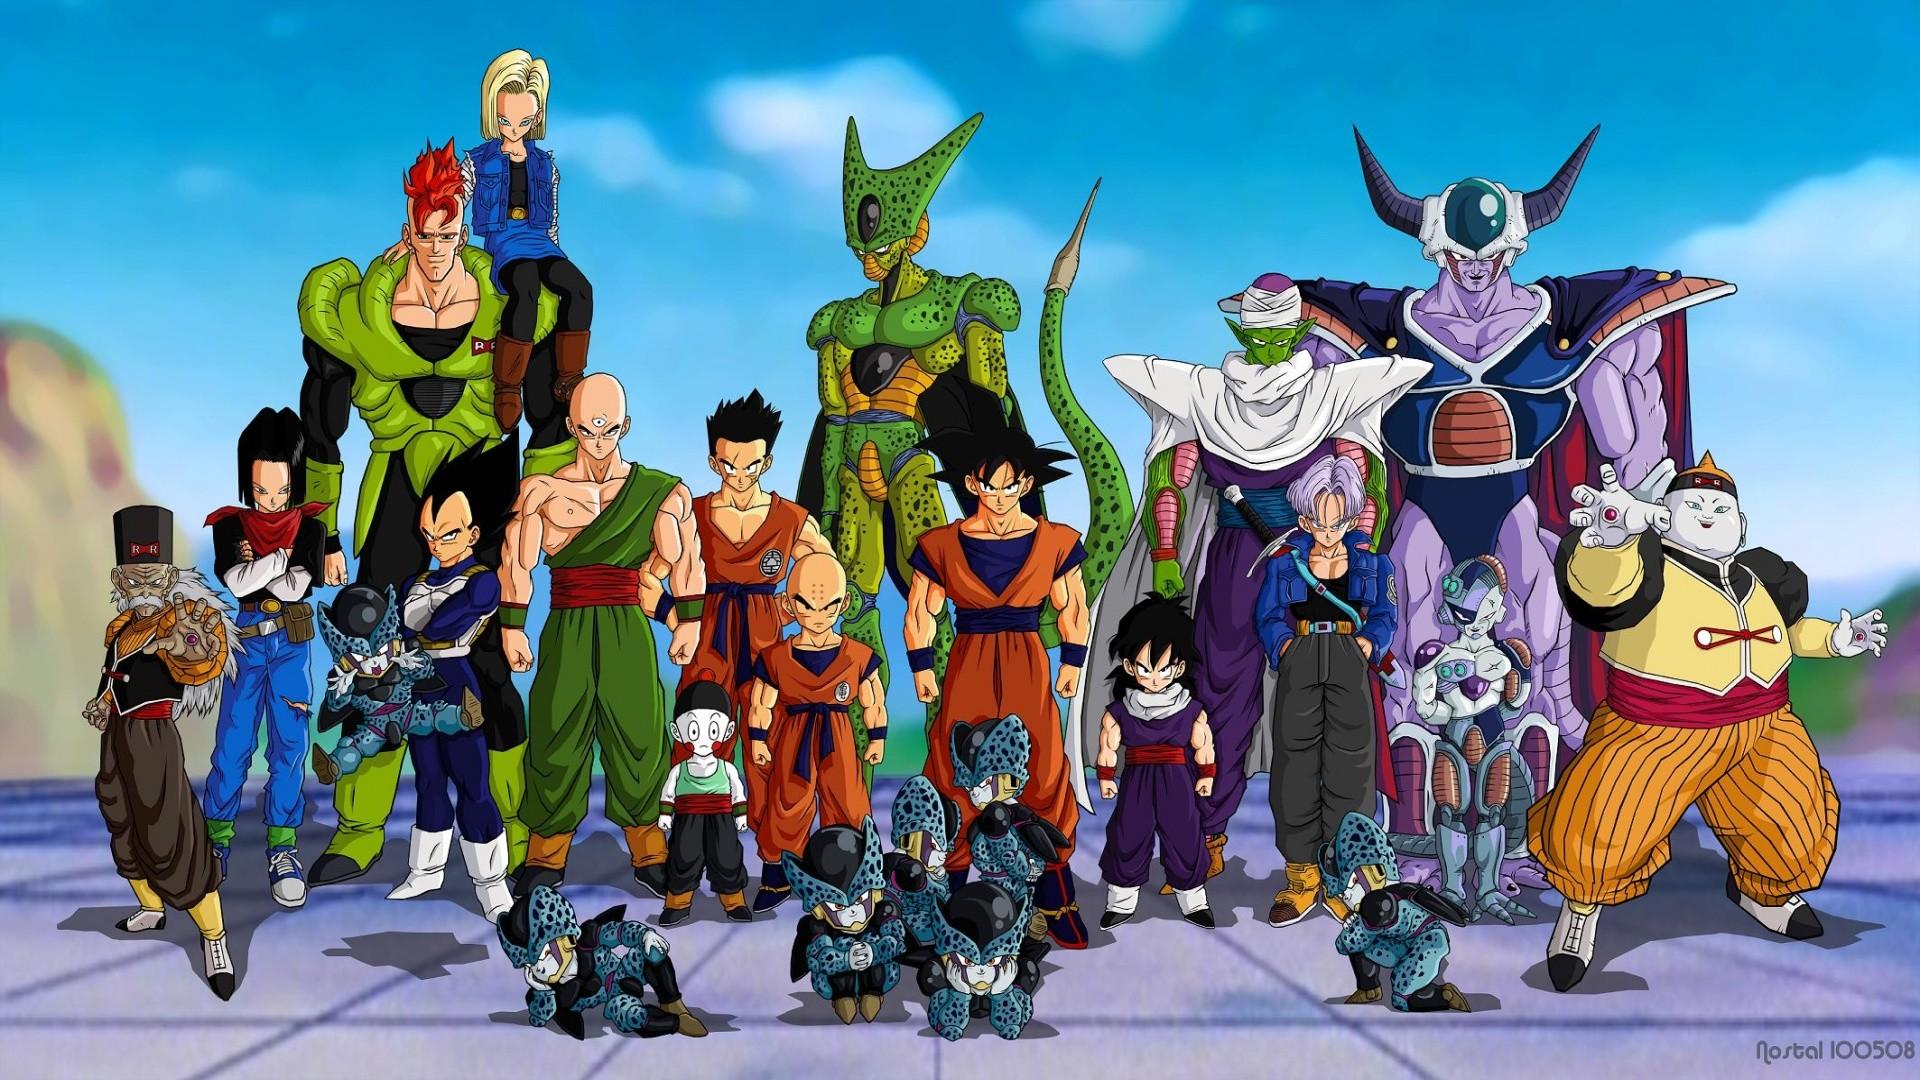 Tags: Dragon Ball , Dragon Ball Z